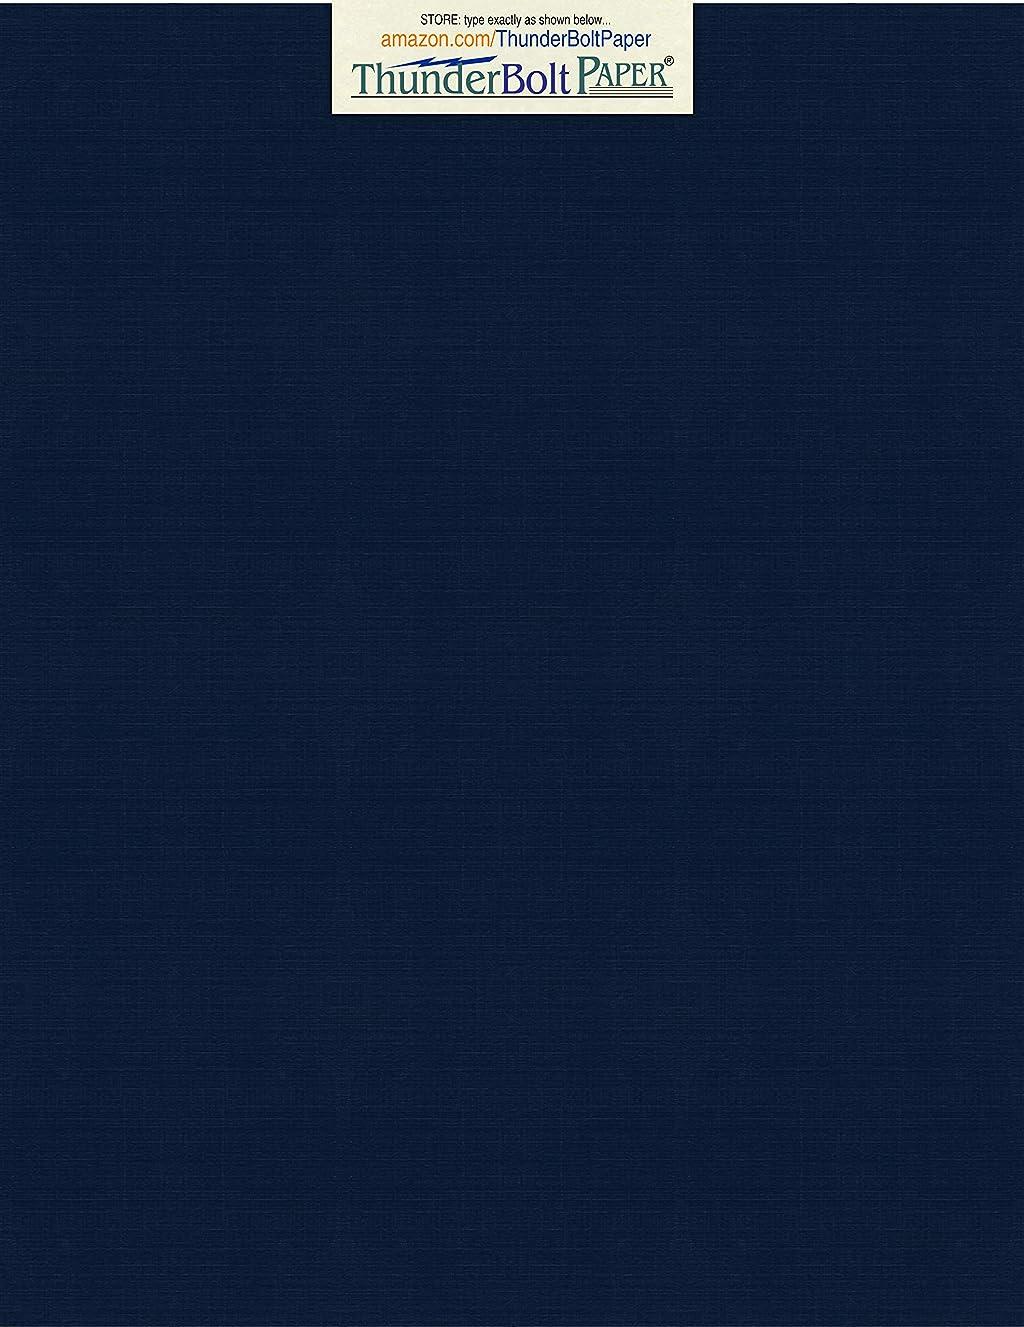 150 Dark Navy Blue Linen 80# Cover Paper Sheets - 8.5